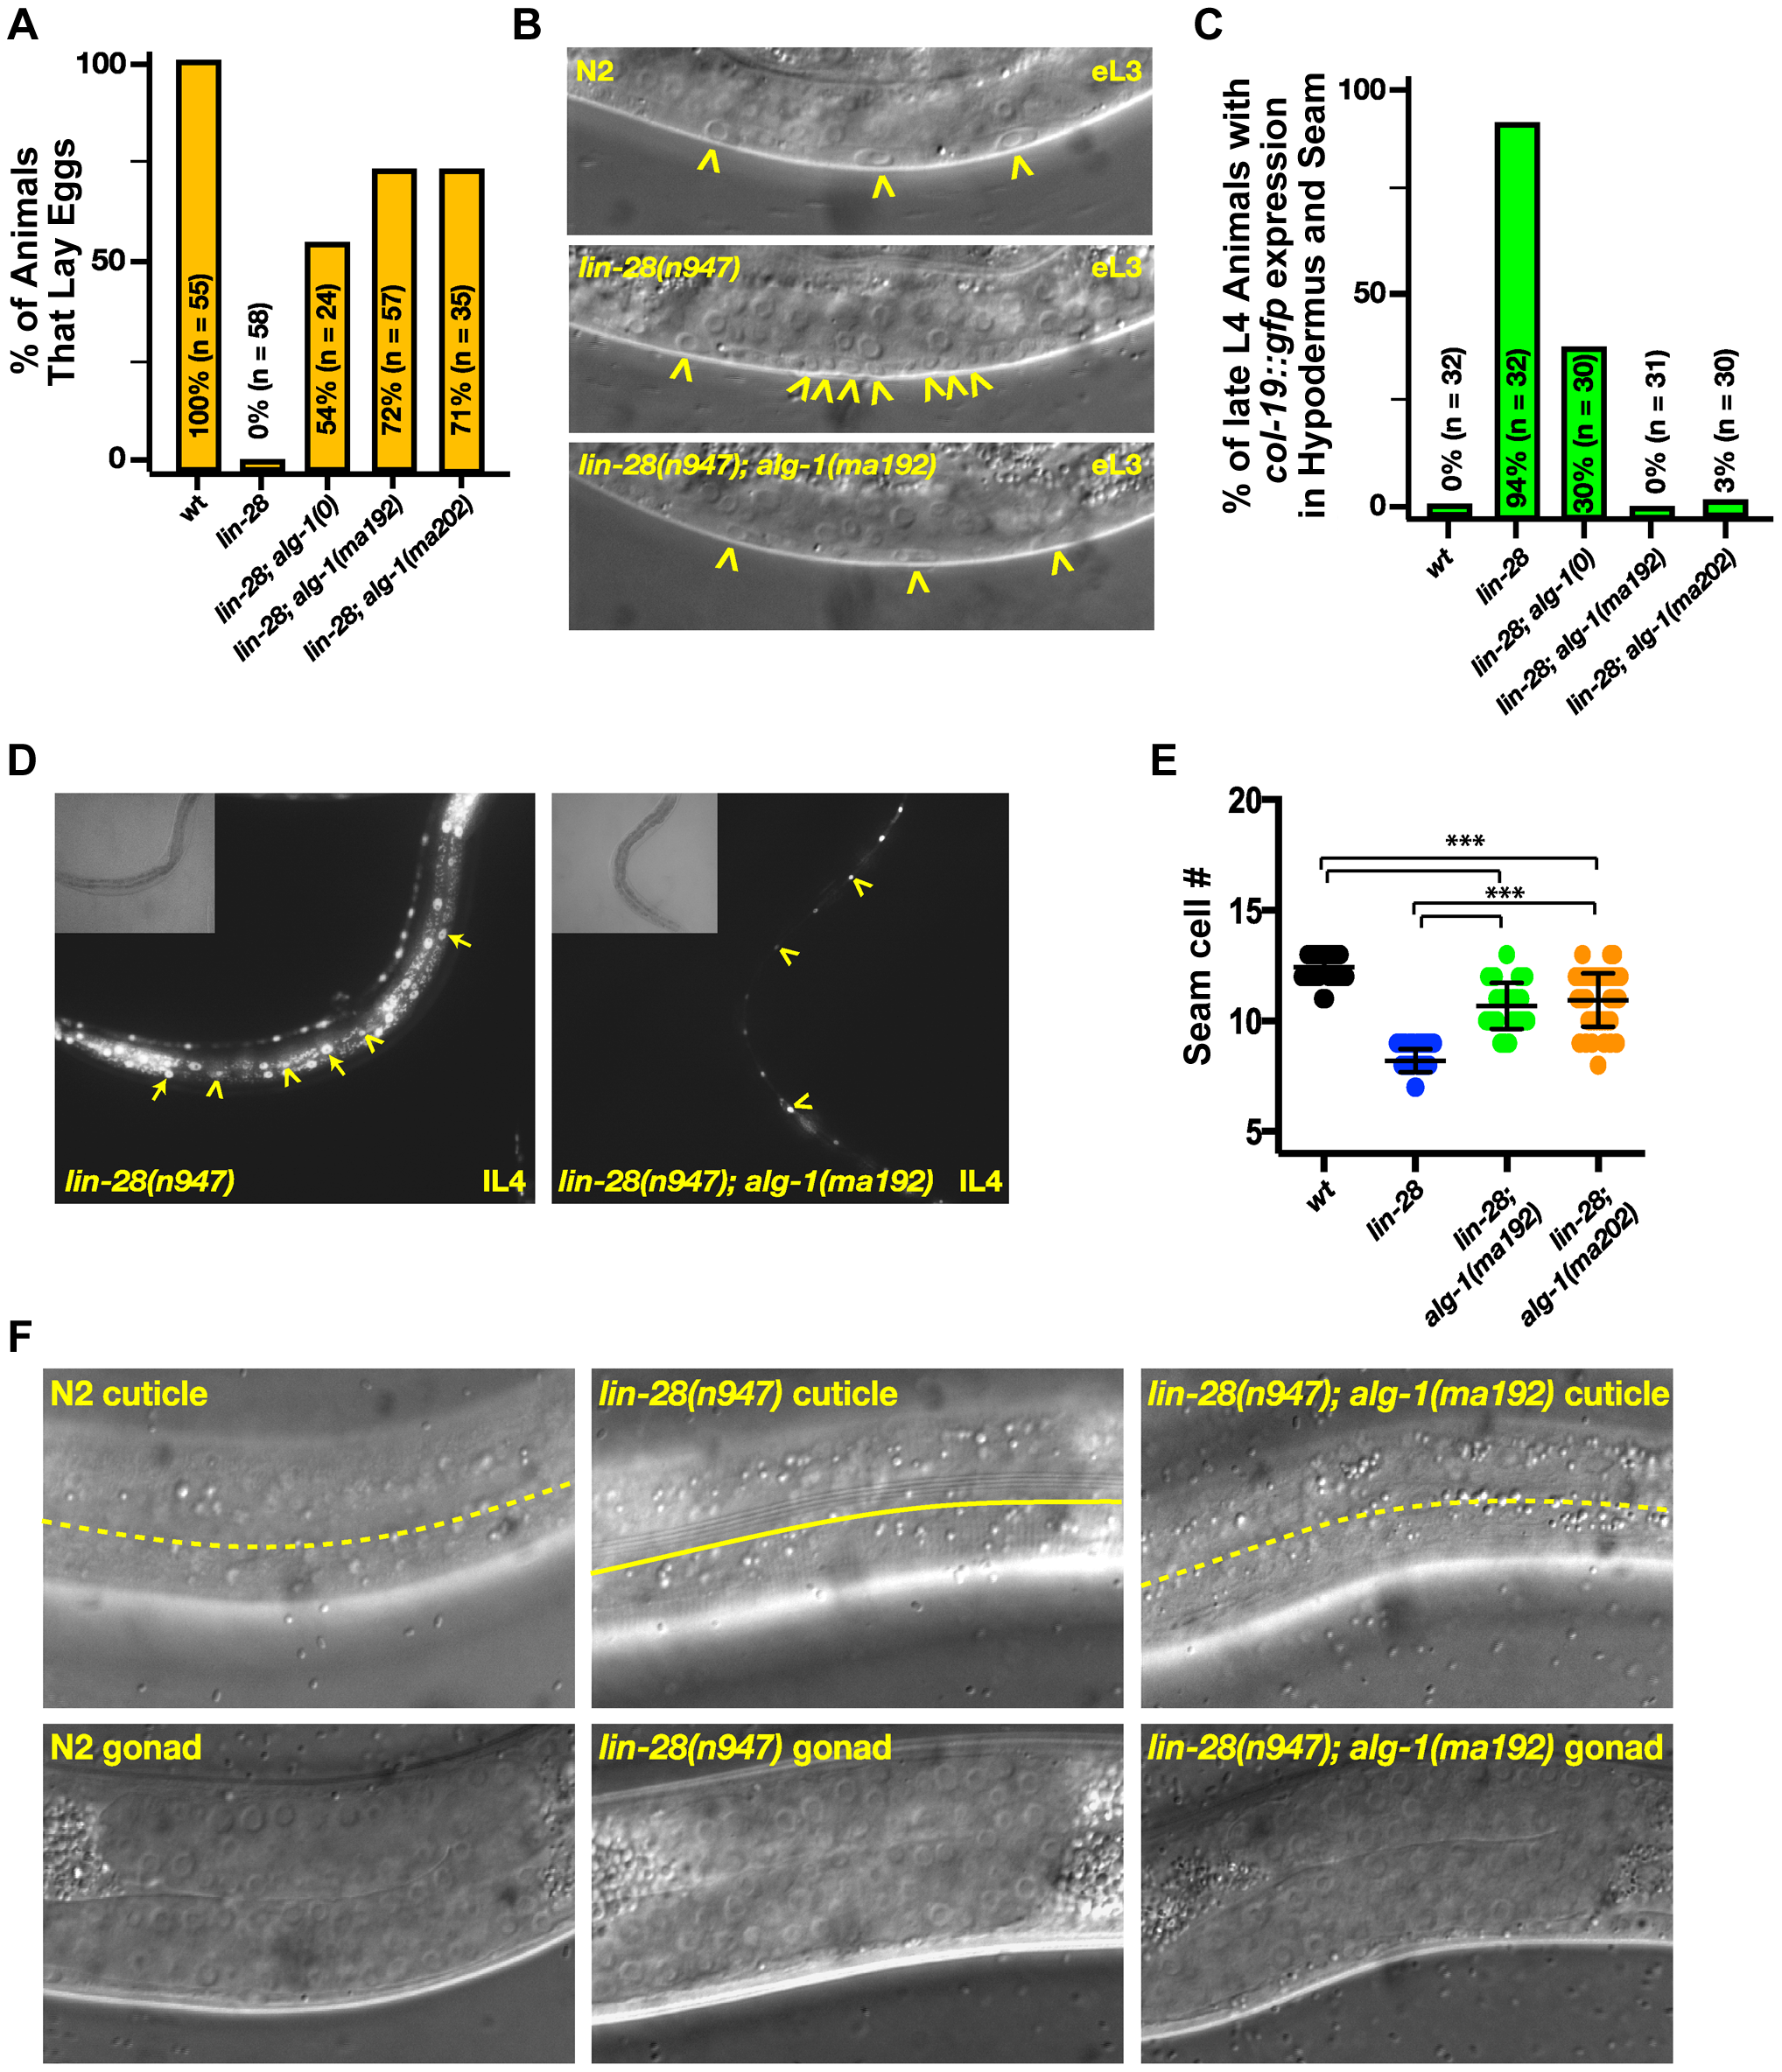 Mutations in <i>alg-1</i> suppress precocious development of <i>lin-28(lf)</i> (<i>lin-28(n947)</i>) animals.